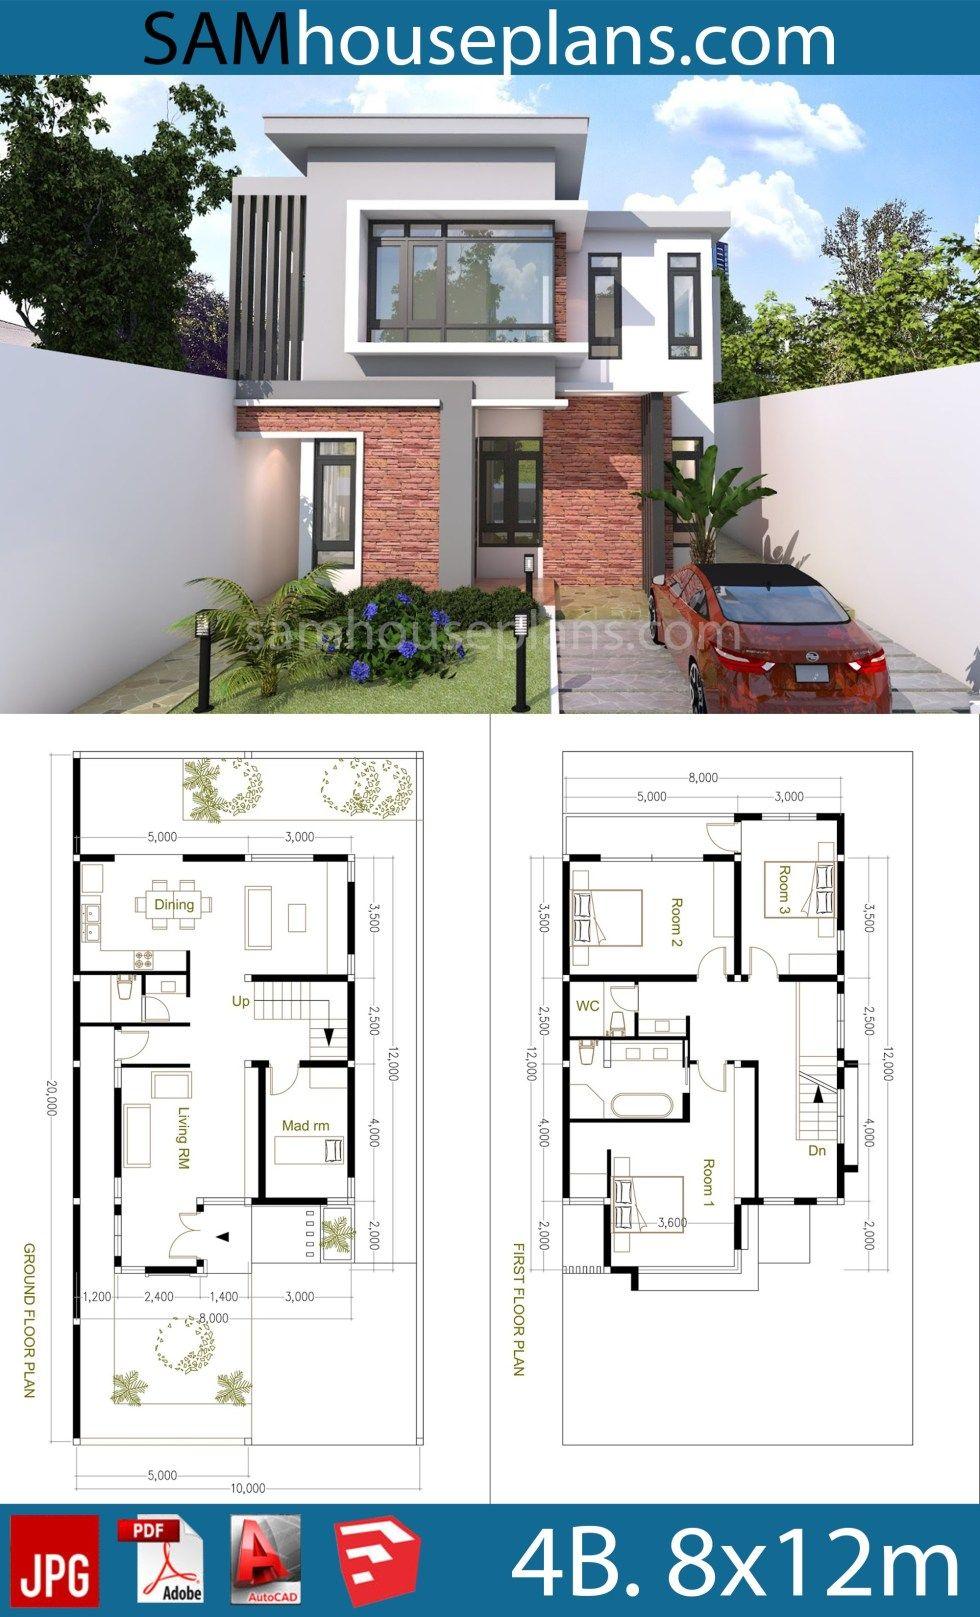 House Plans 8x12m With 4 Bedrooms Sam House Plans Sims House Plans Duplex House Design Model House Plan